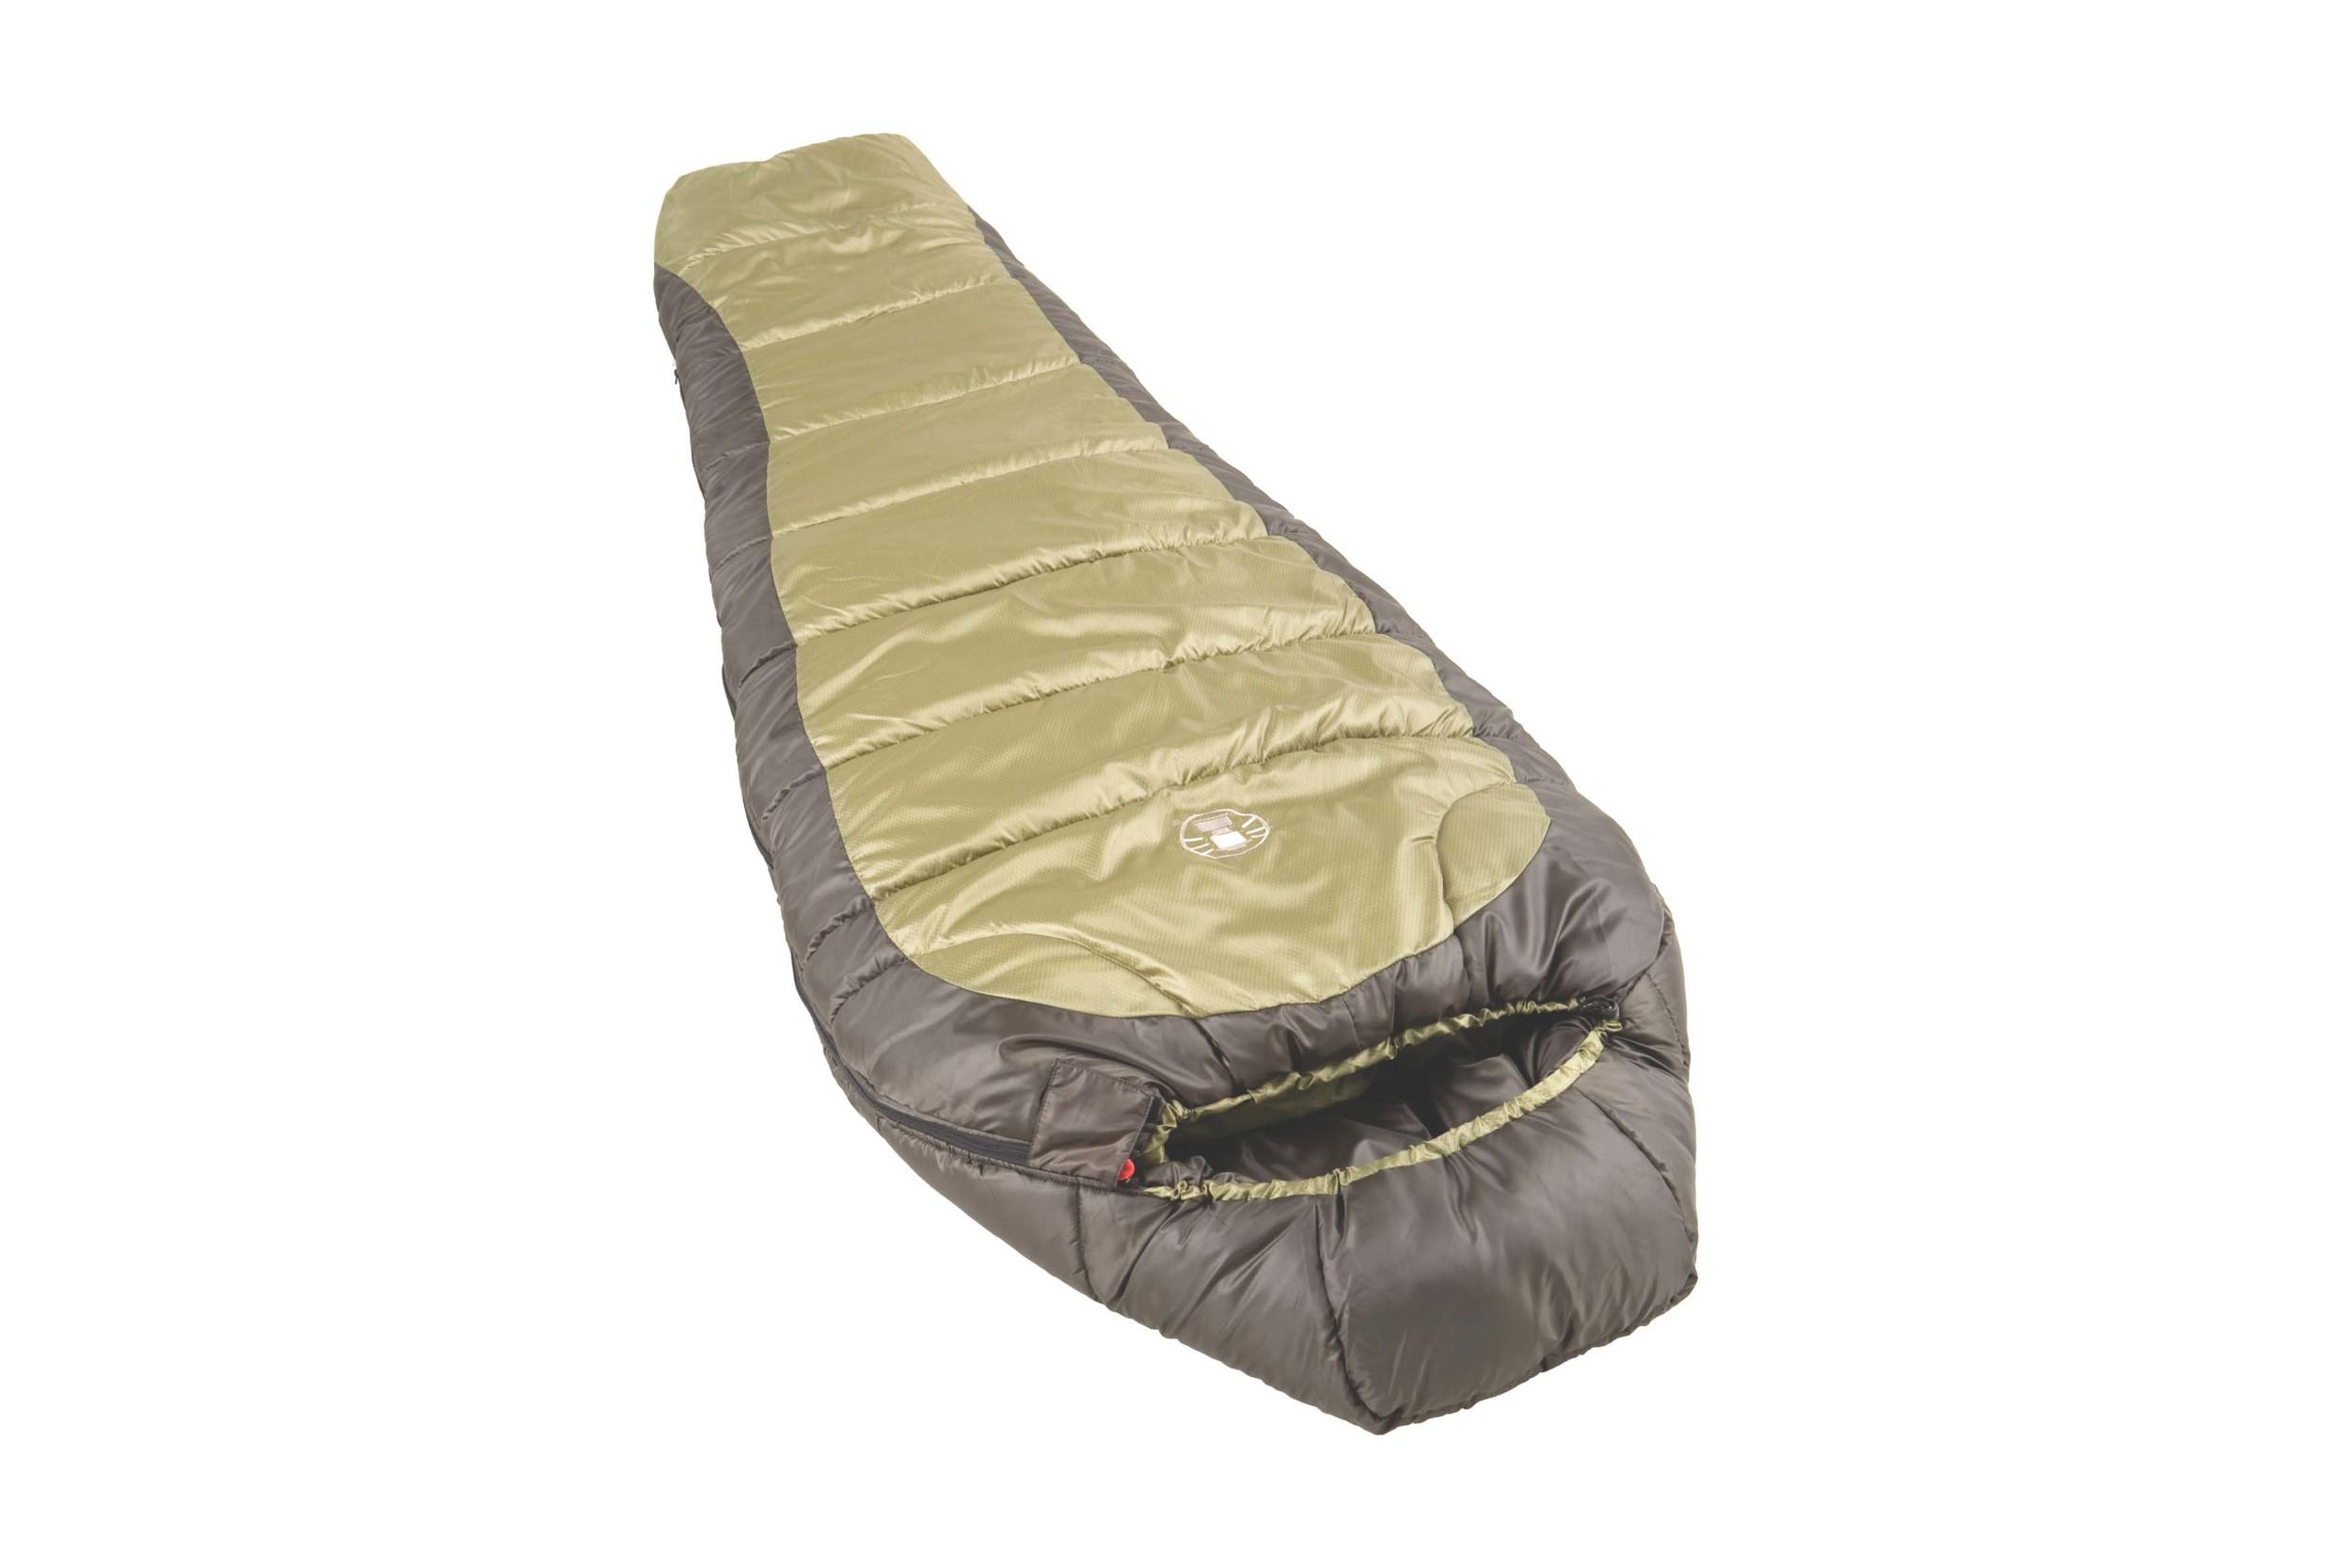 Extreme Weather Sleeping Bag 4.5 stars - $41 (Prime)